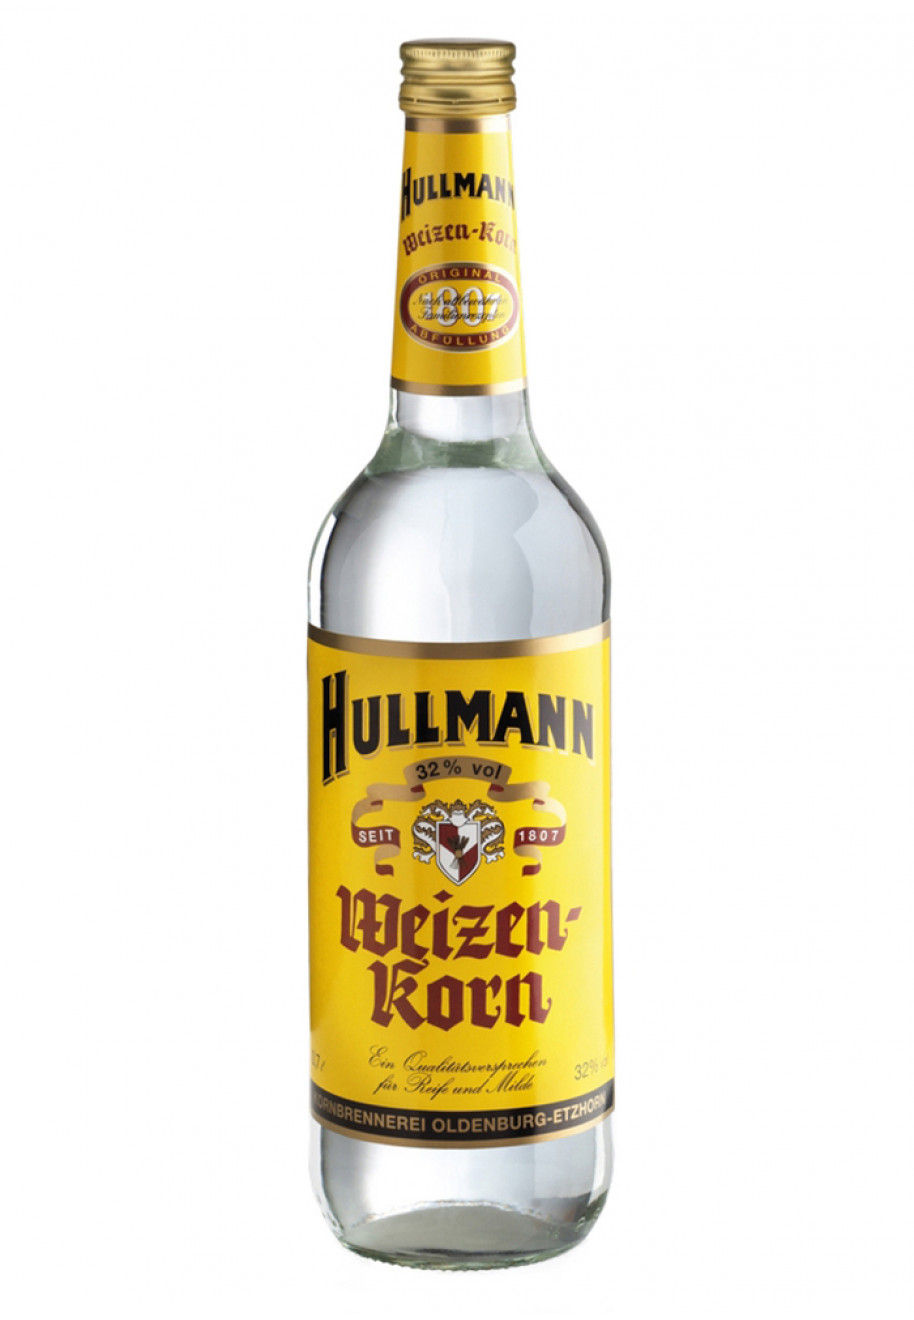 Hullmann Weizenkorn